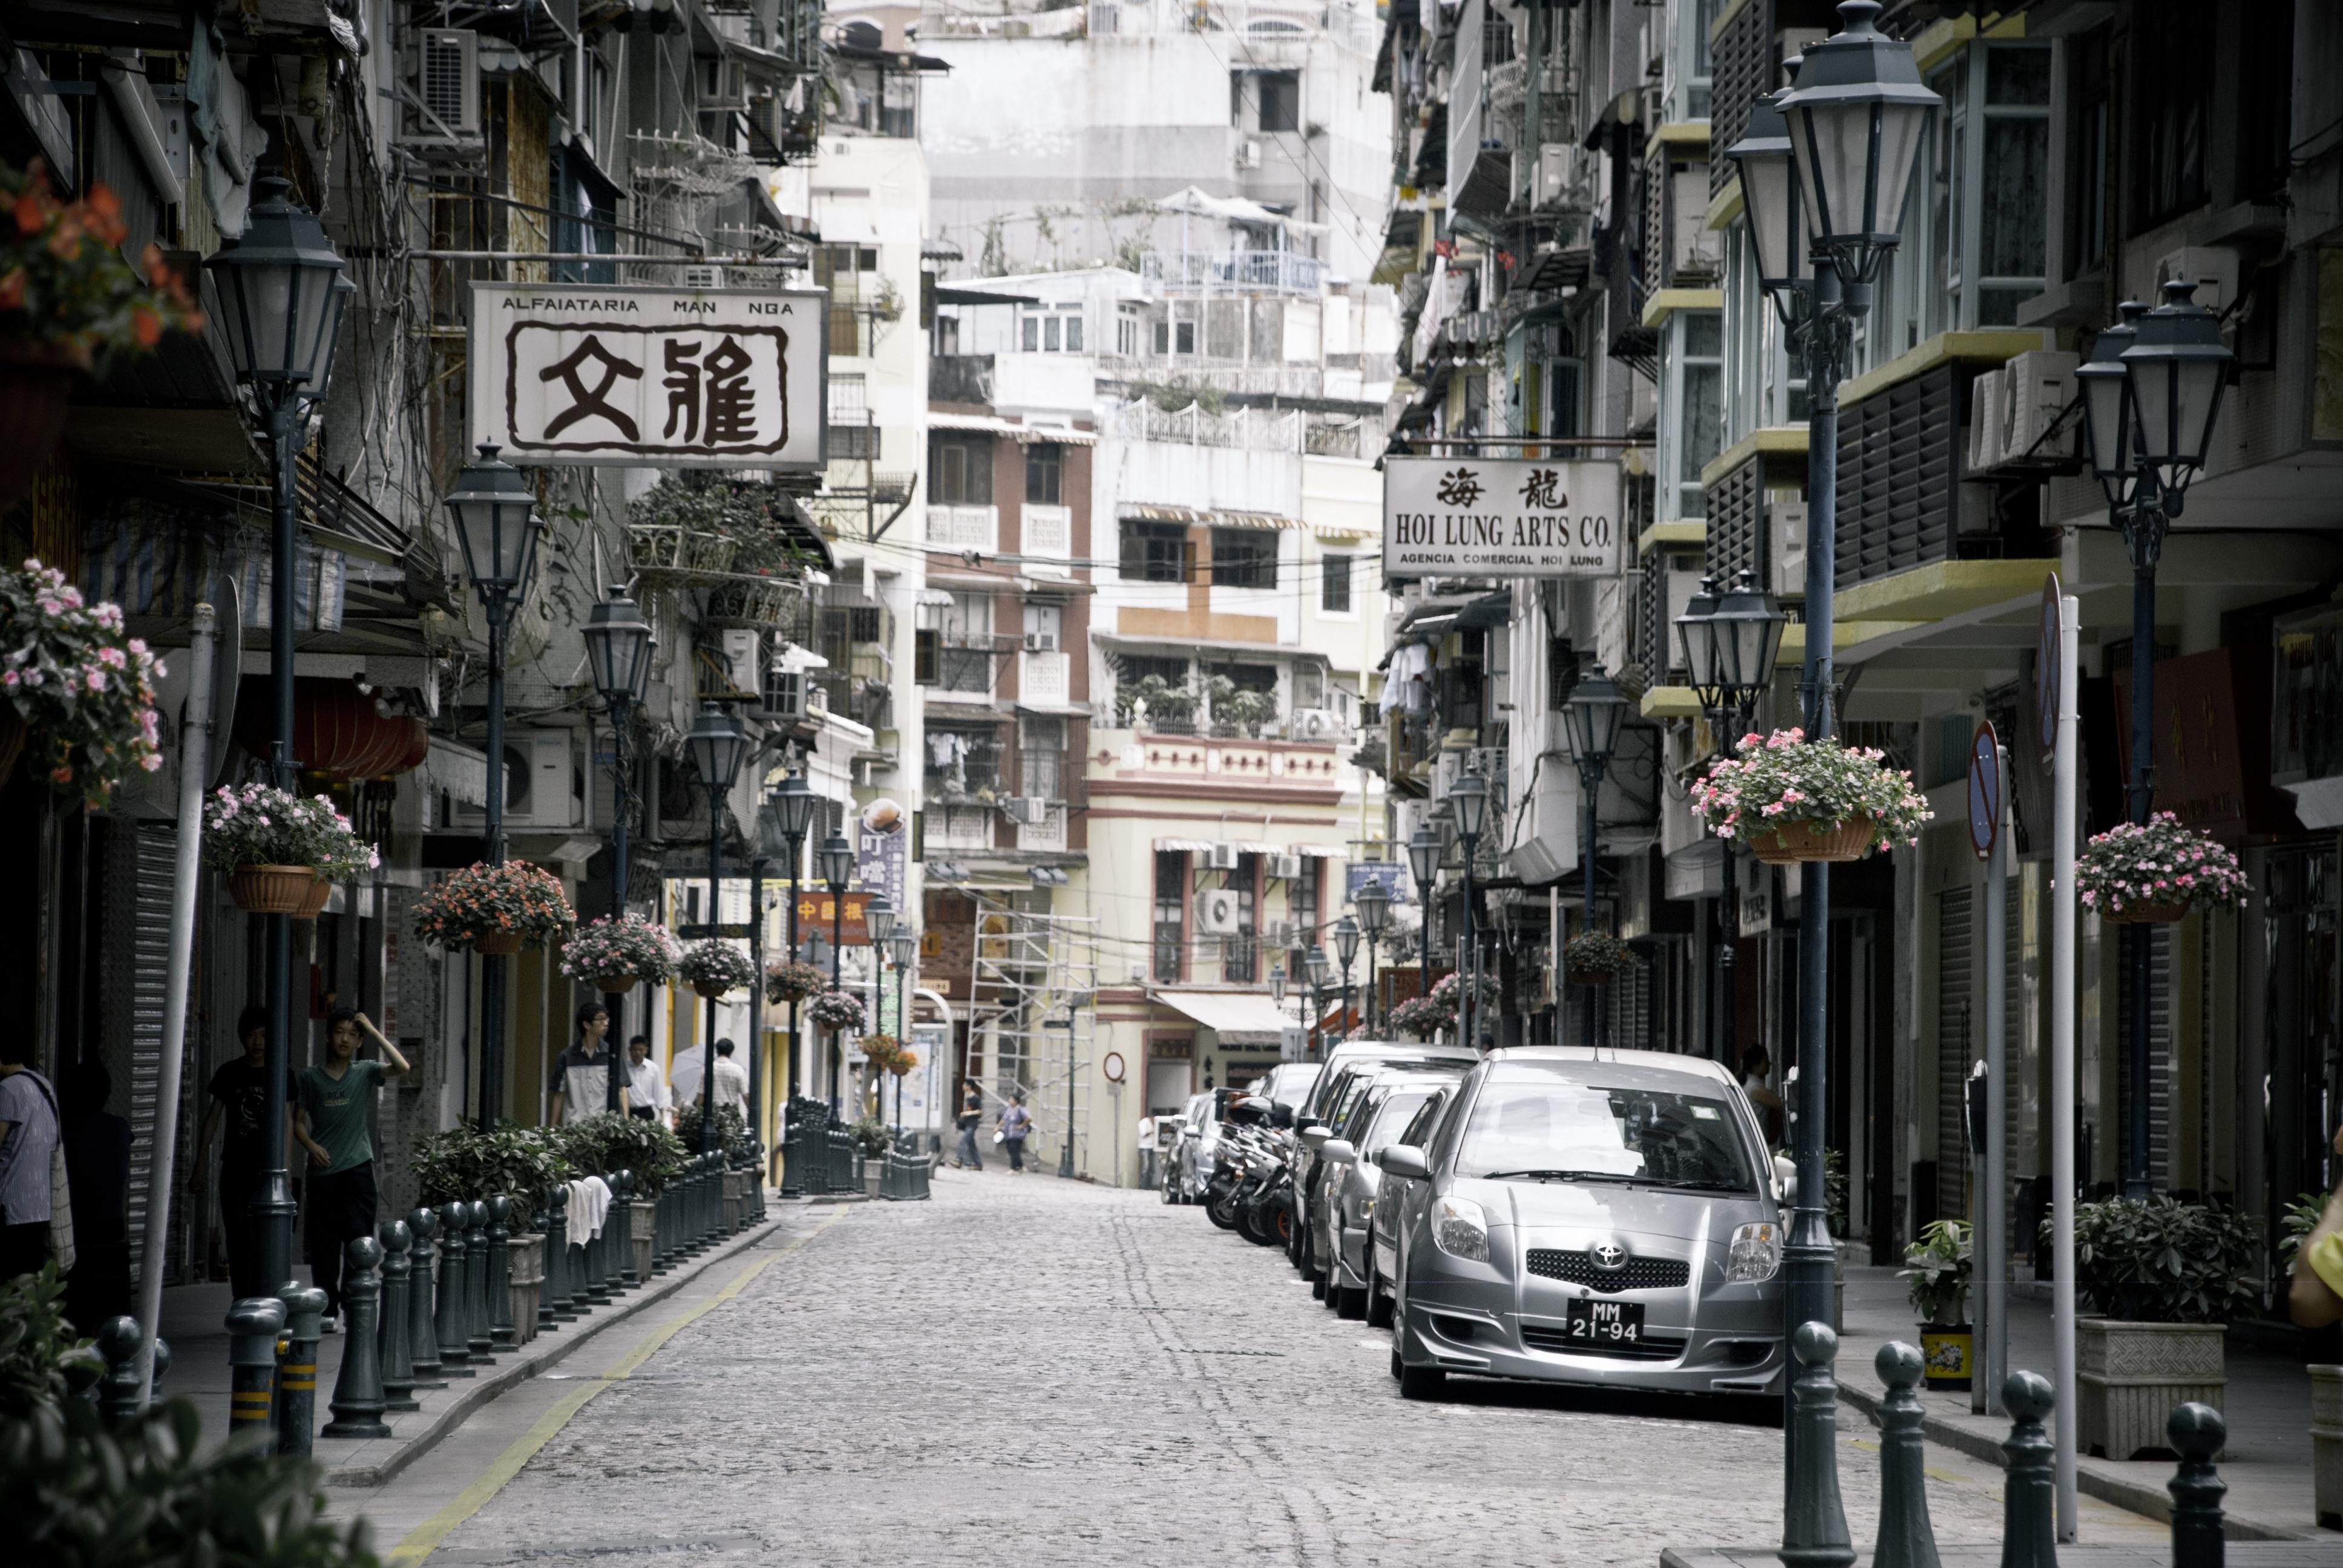 Macau, SAR, China